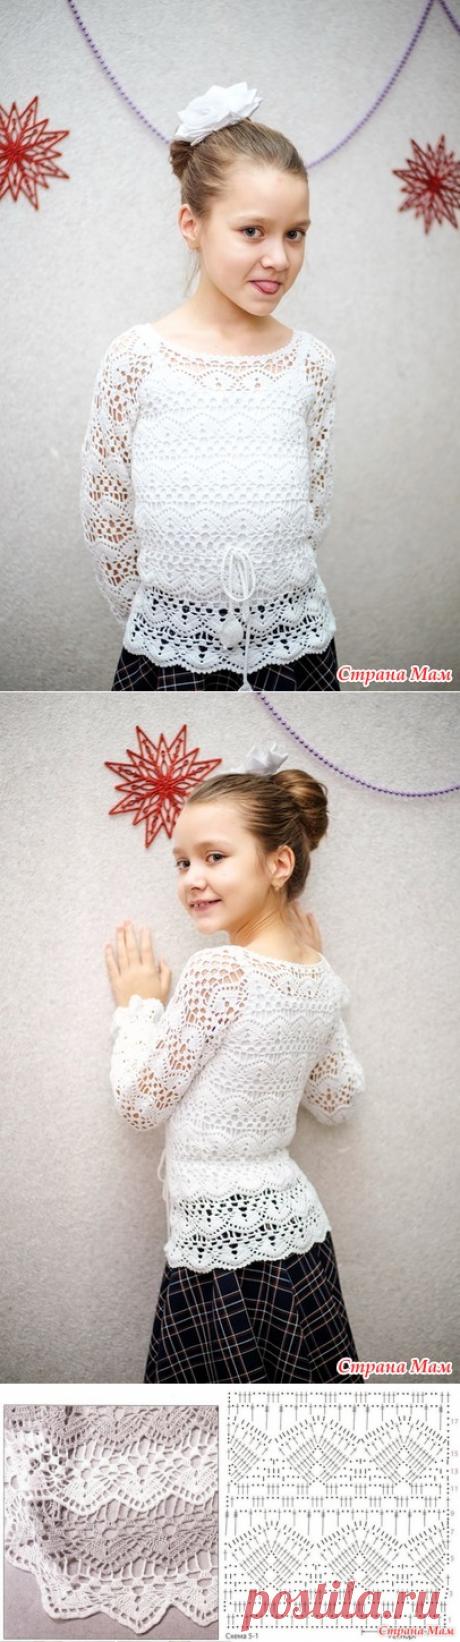 . Школьная блузка крючком - Вязание - Страна Мам